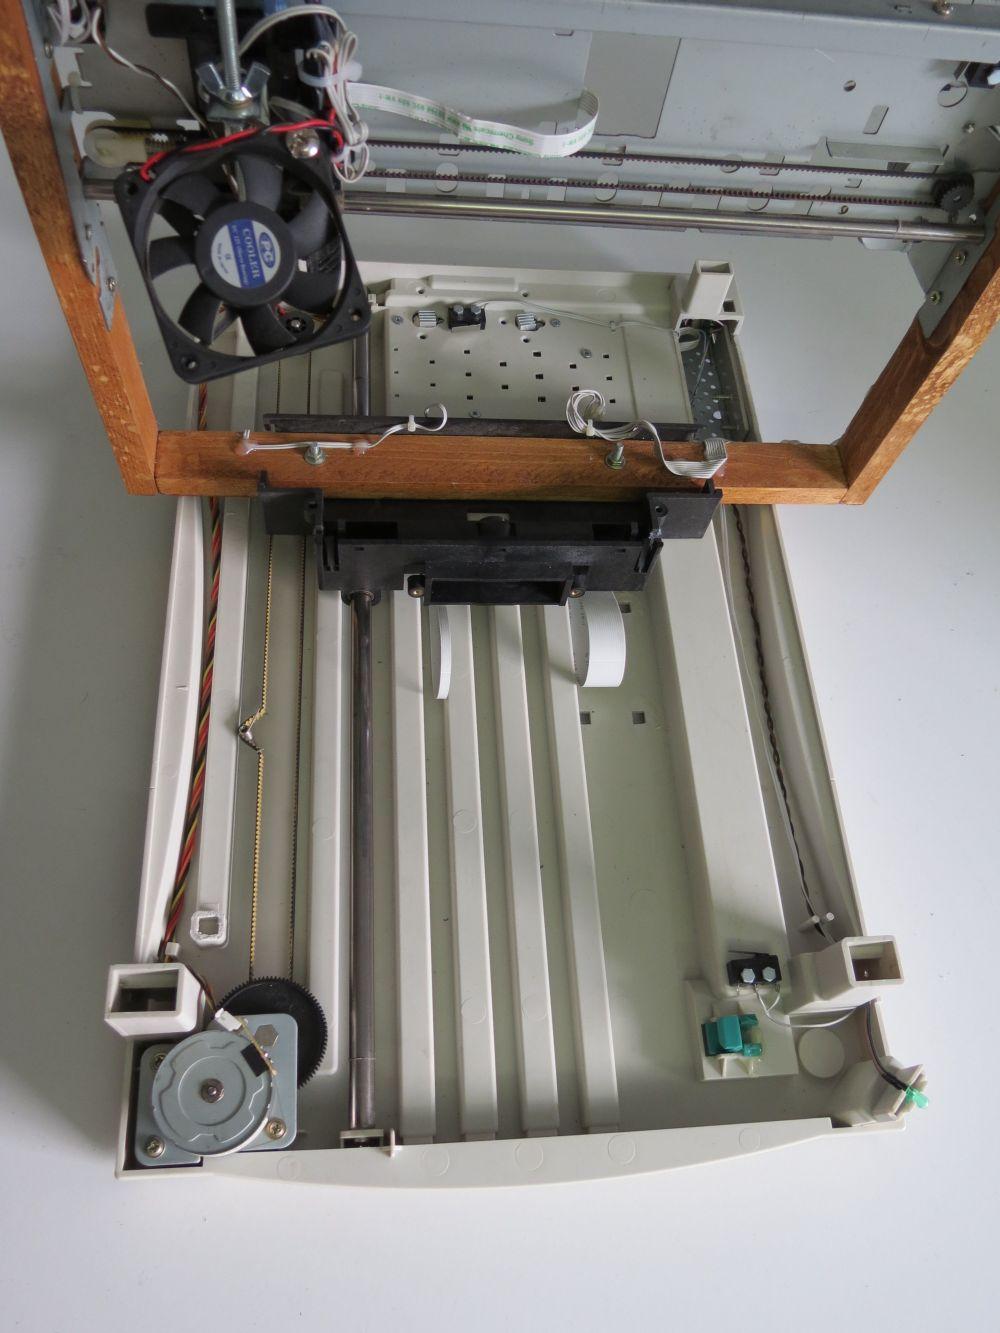 Impresoras 3d soloelectronicos for Impresora 3d laser